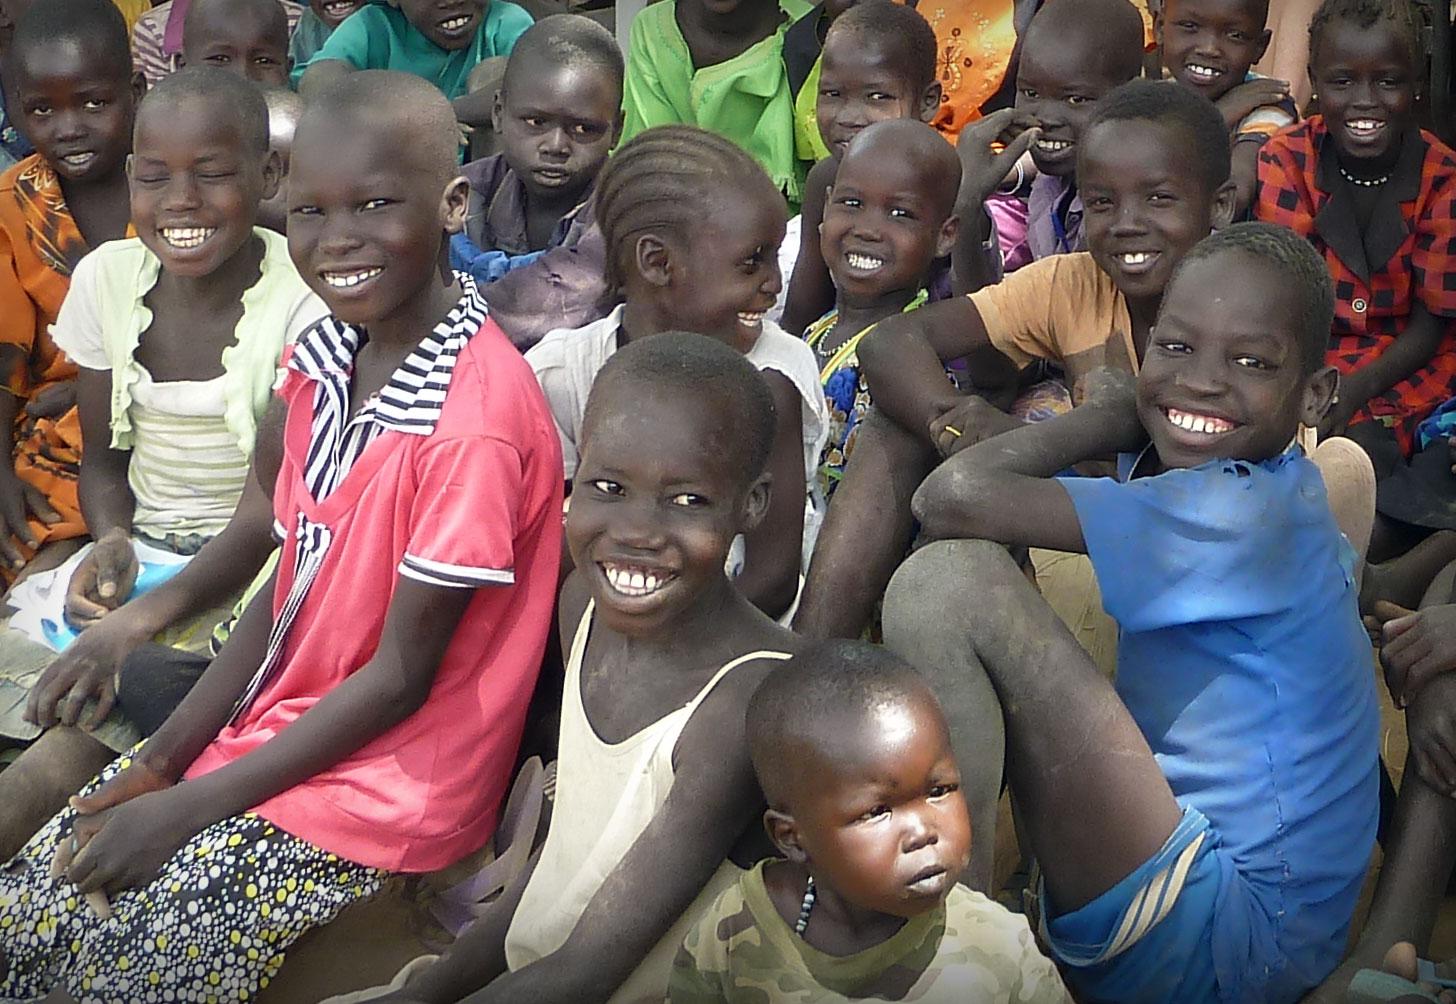 Photo courtesyLost Boys Rebuilding Southern Sudan